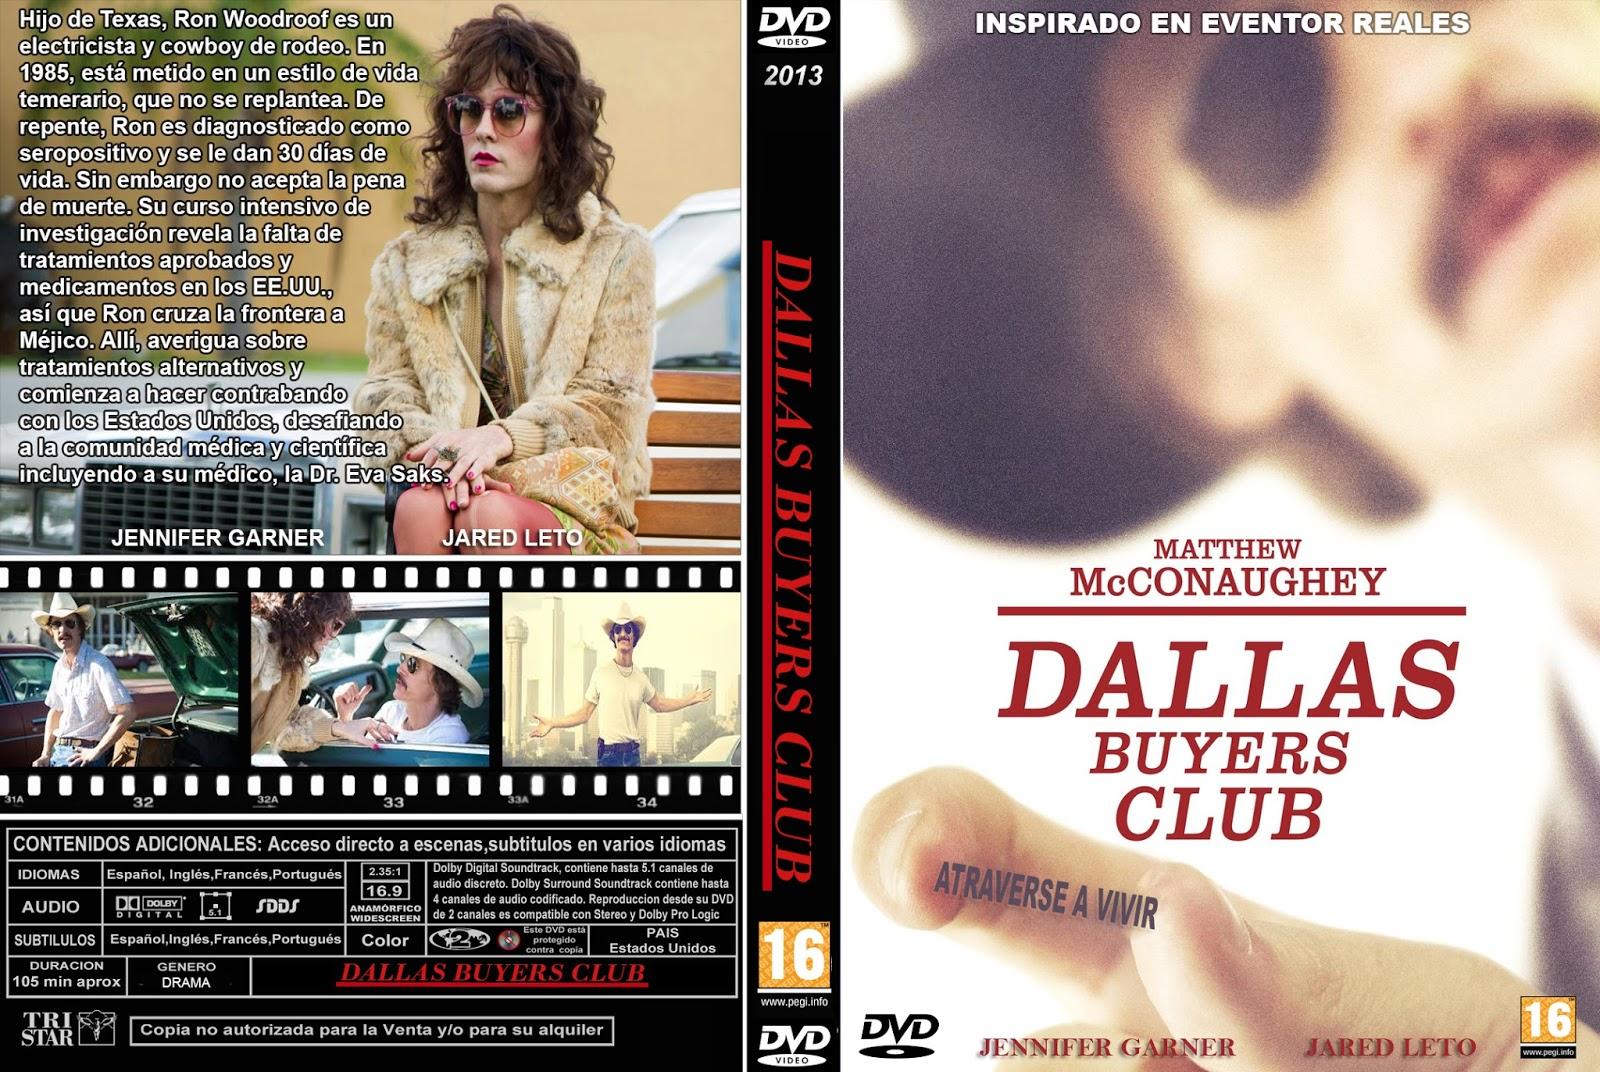 PB   DVD Cover / Caratula FREE: DALLAS BUYERS CLUB - DVD ...   1600 x 1072 jpeg 484kB